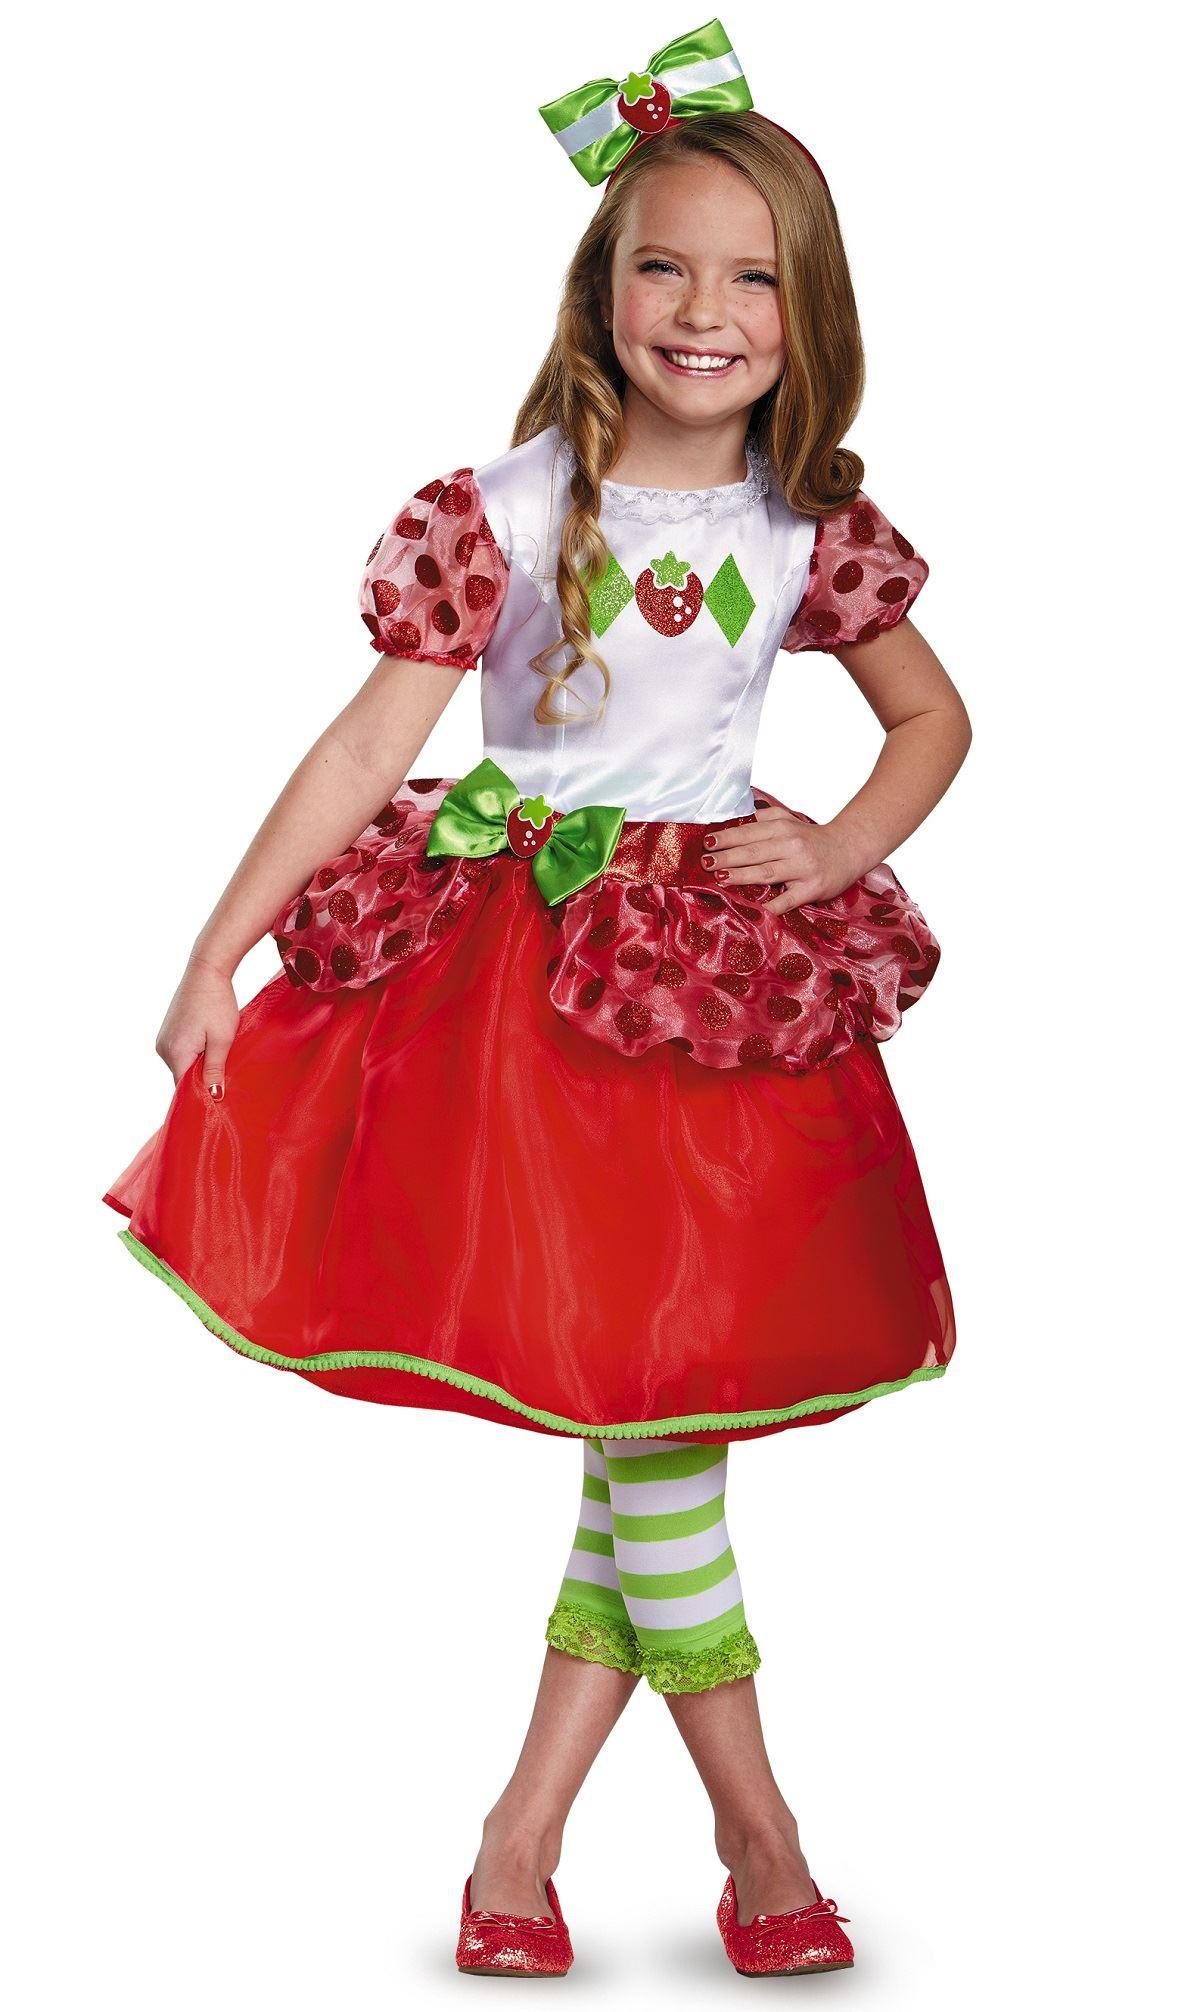 Kids Strawberry Shortcake Girls Costume  c1221c166bfa